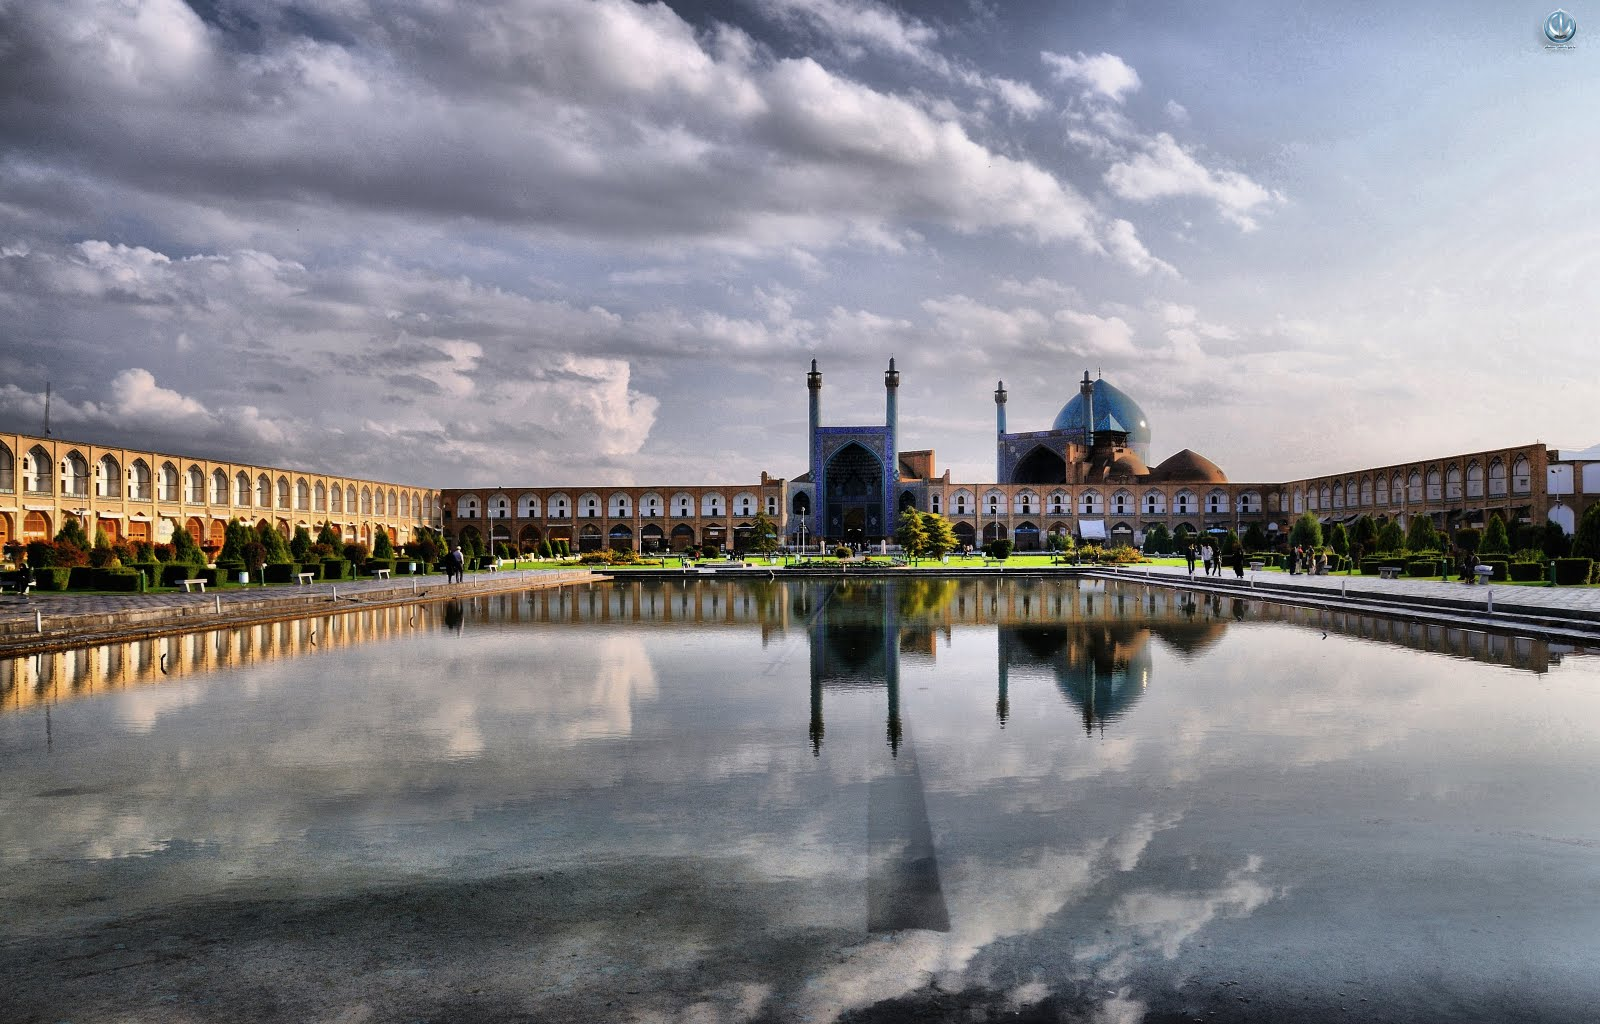 Day 5: Isfahan